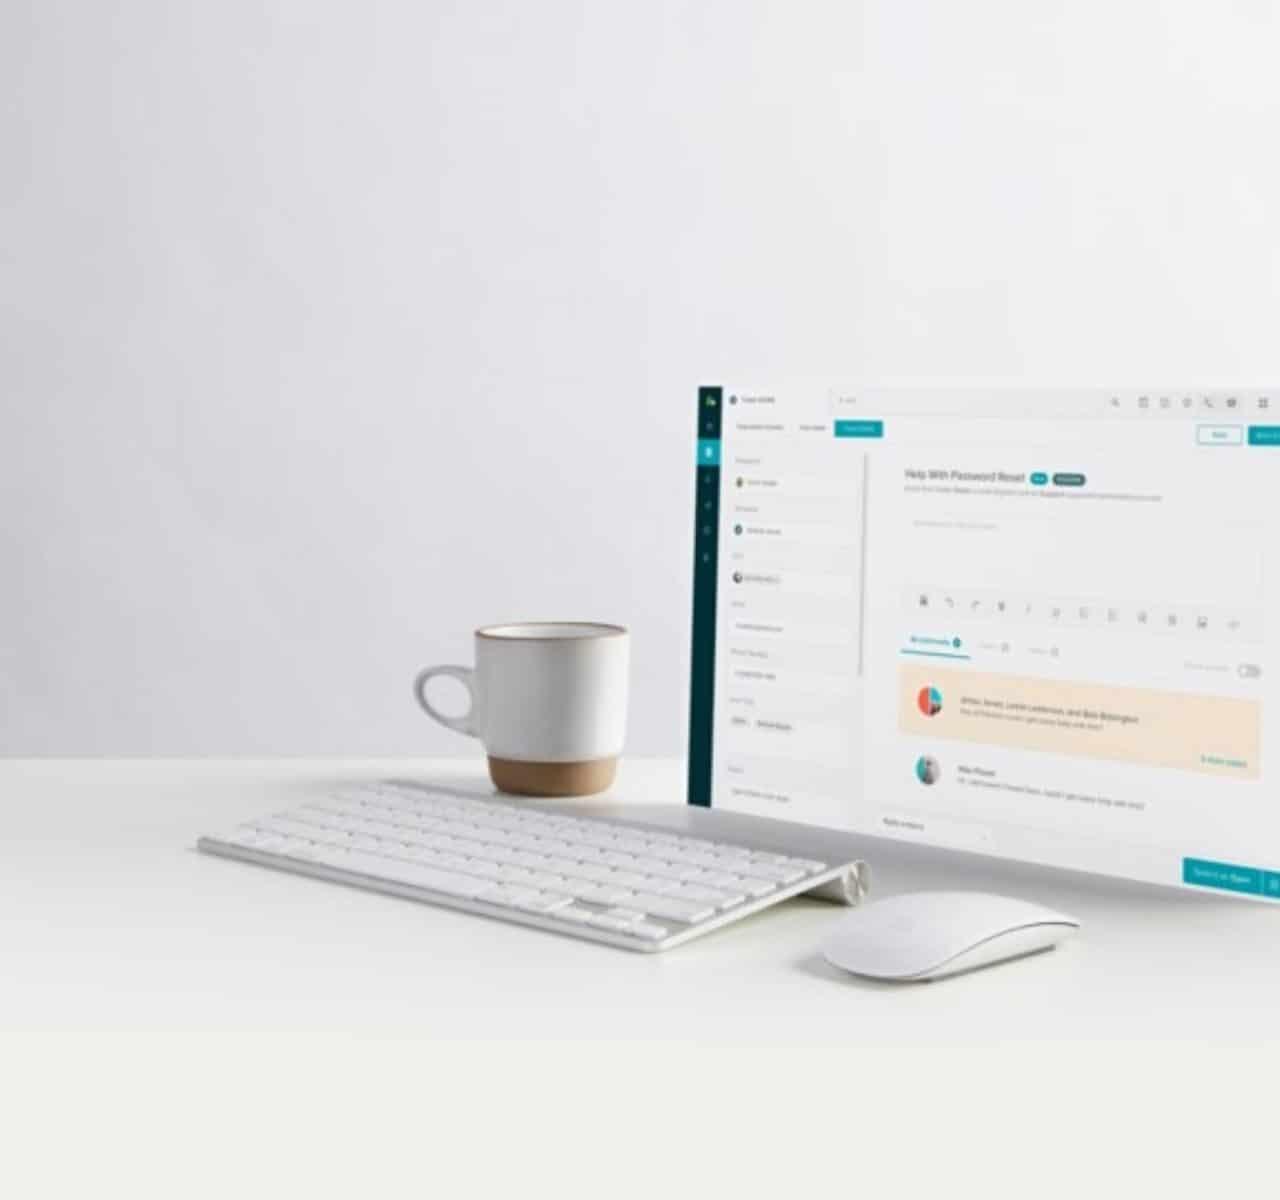 Zendesk customer support services